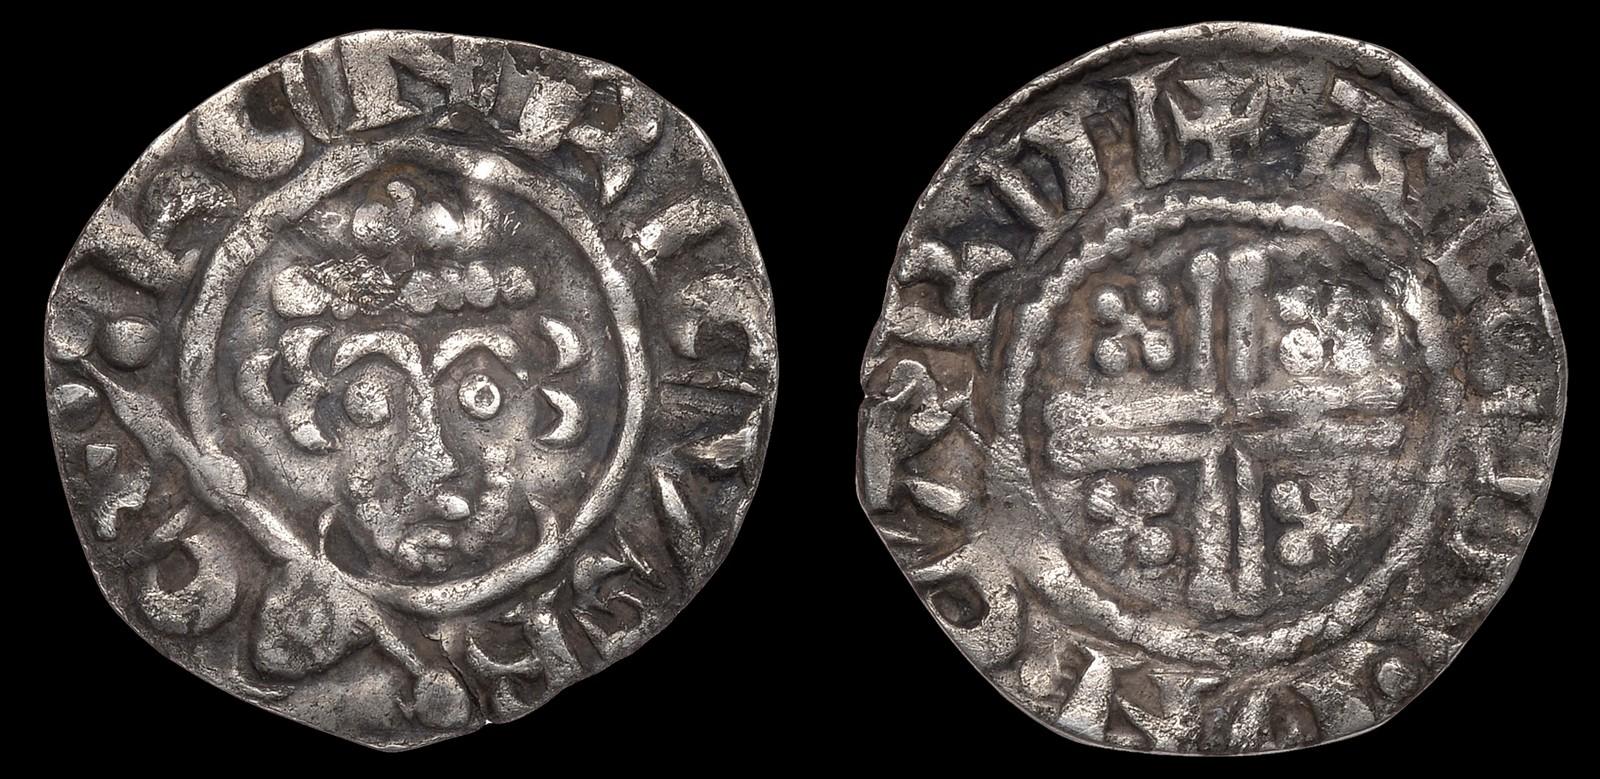 Lot 36 - BRITISH COINS, Richard I (1189-1199), Penny, class IVa, Carlisle, Alain, alein · on · cardi, 1.12g/